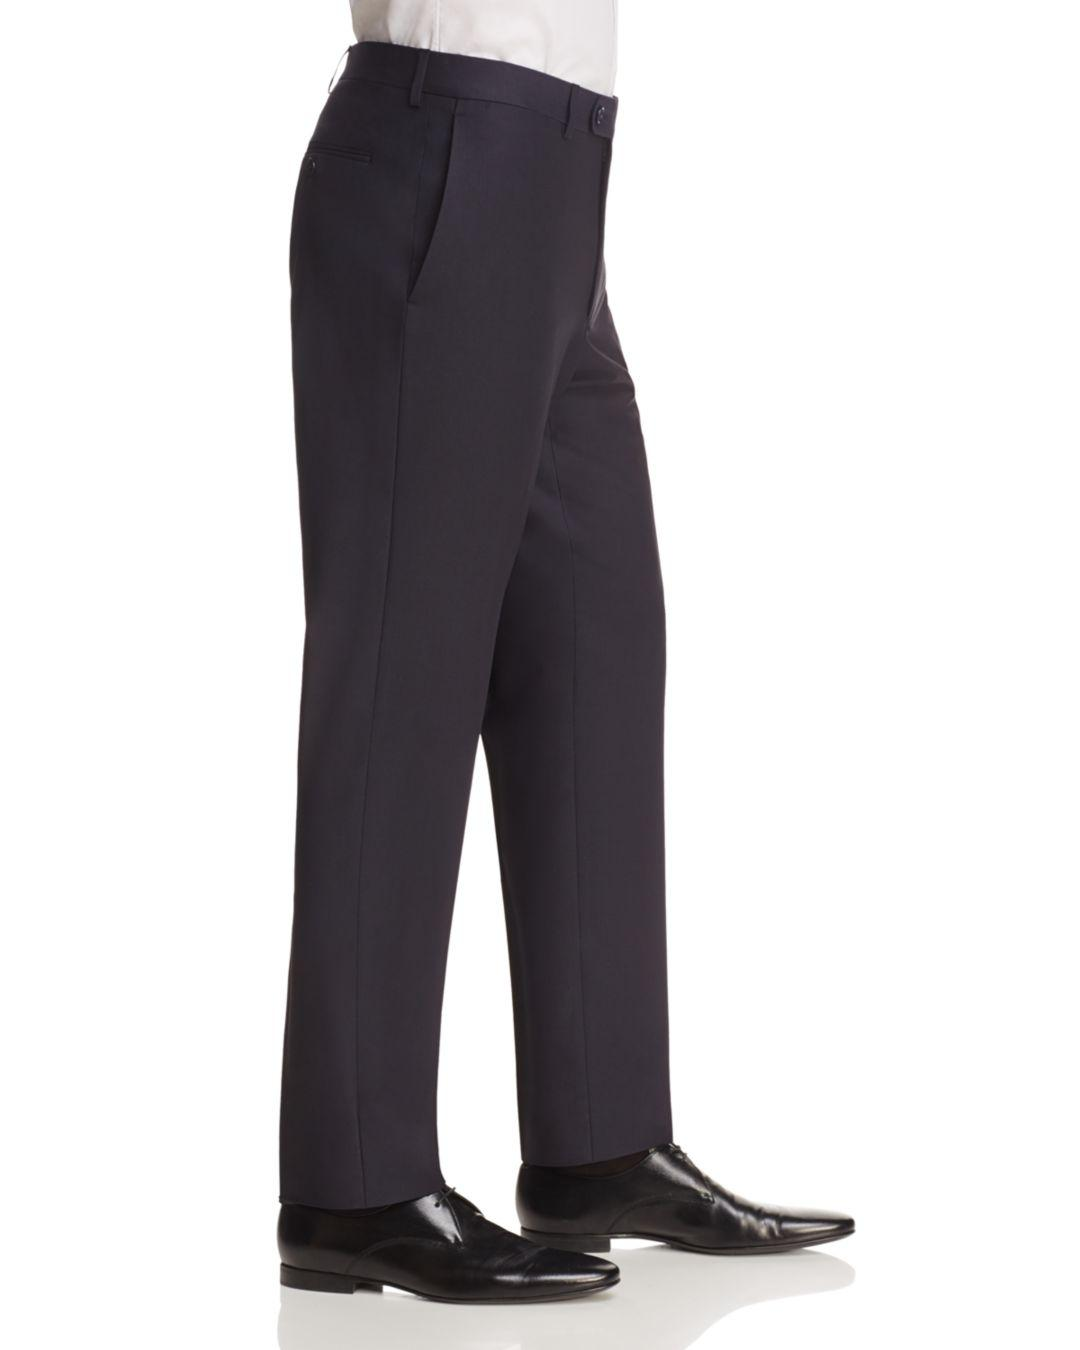 John Varvatos Regular Fit Trousers in Navy (Blue) for Men